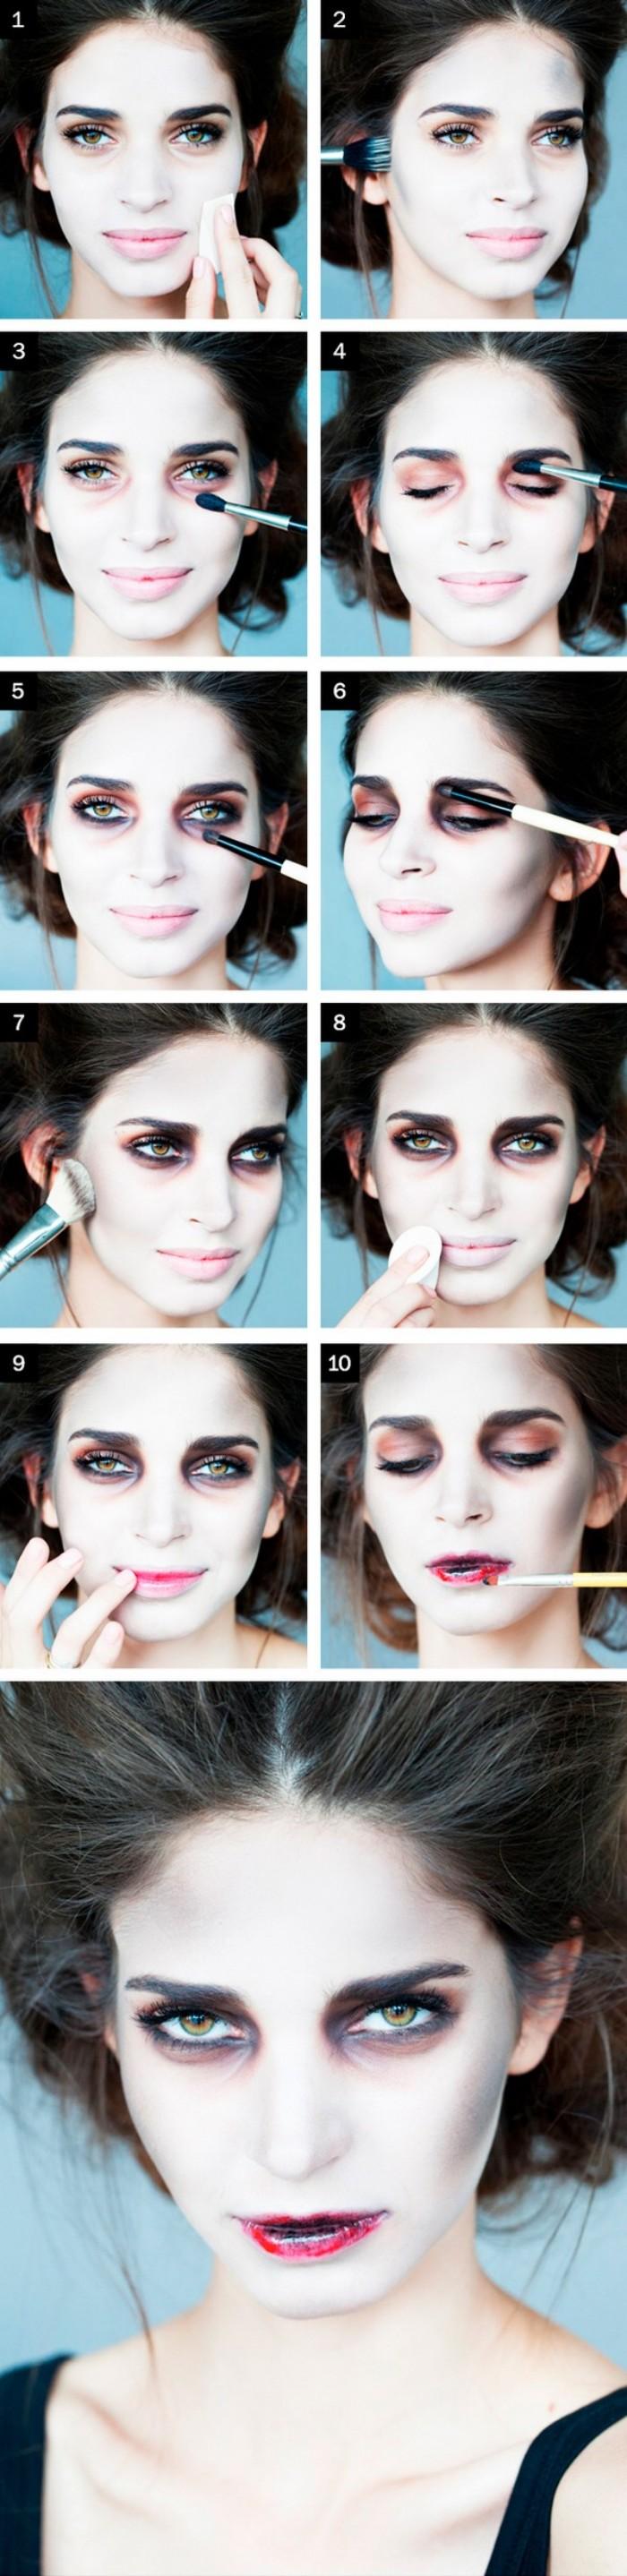 halloween schminkideen eine anleitung in elf bildern zombie oder vampir frau schminken